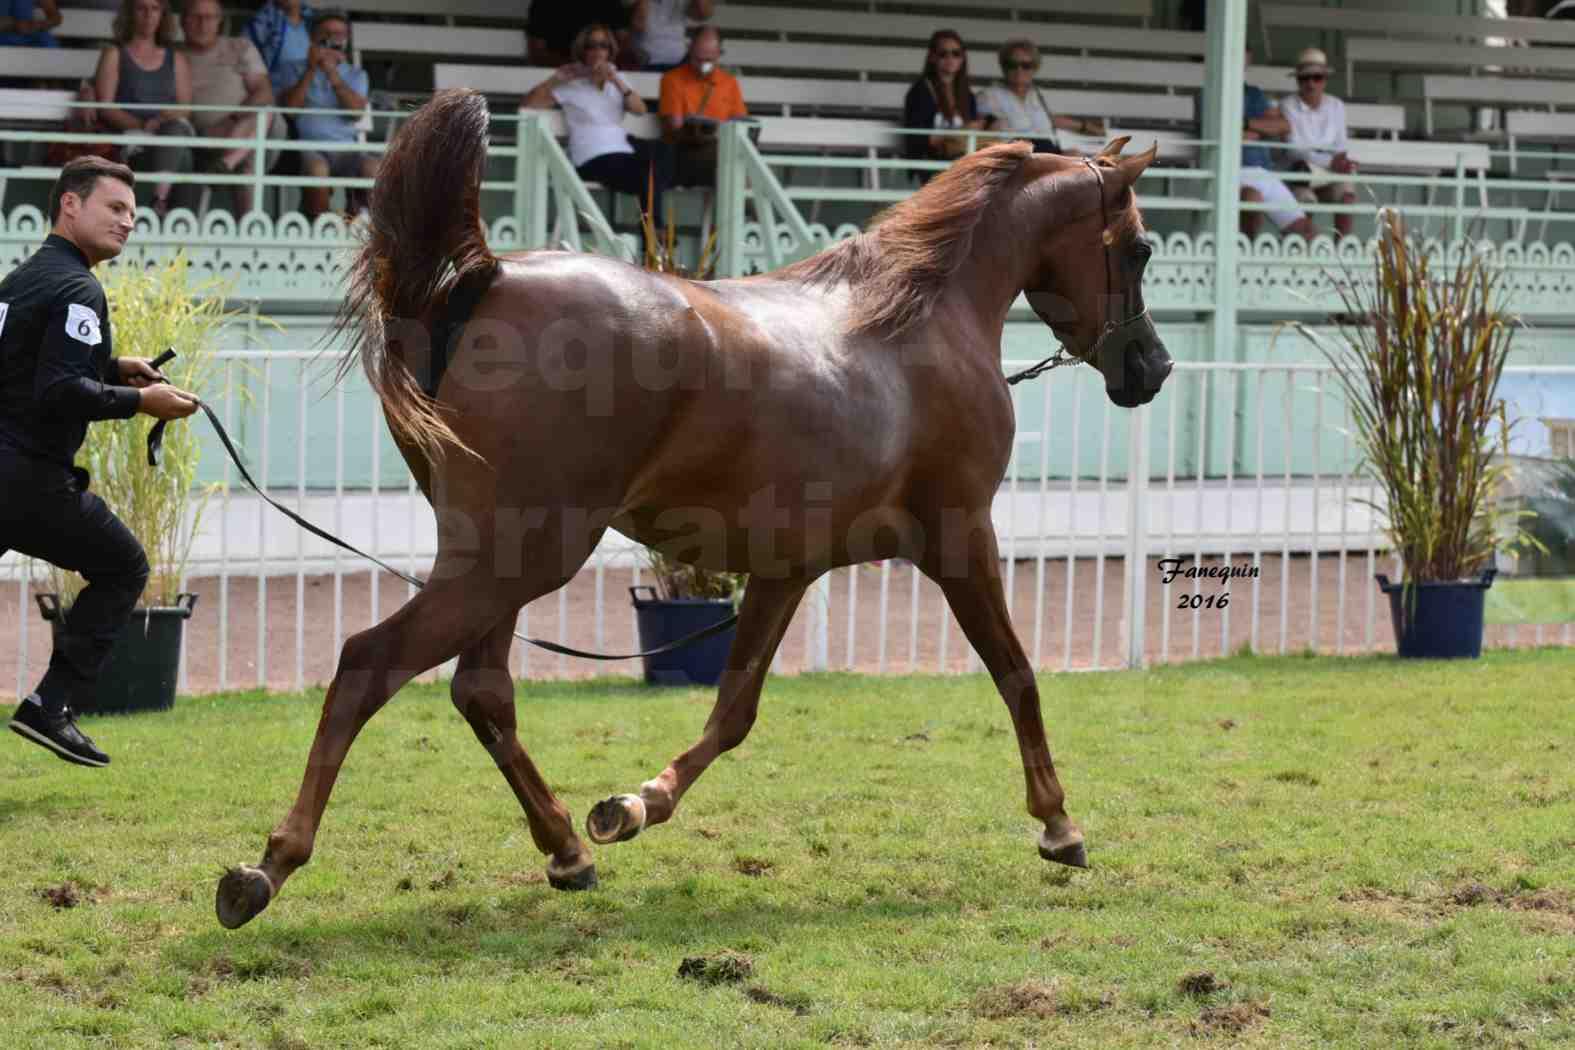 International Arabian Horse Show B de VICHY 2016 - PEARL DE DJOON - Notre Sélection - 36